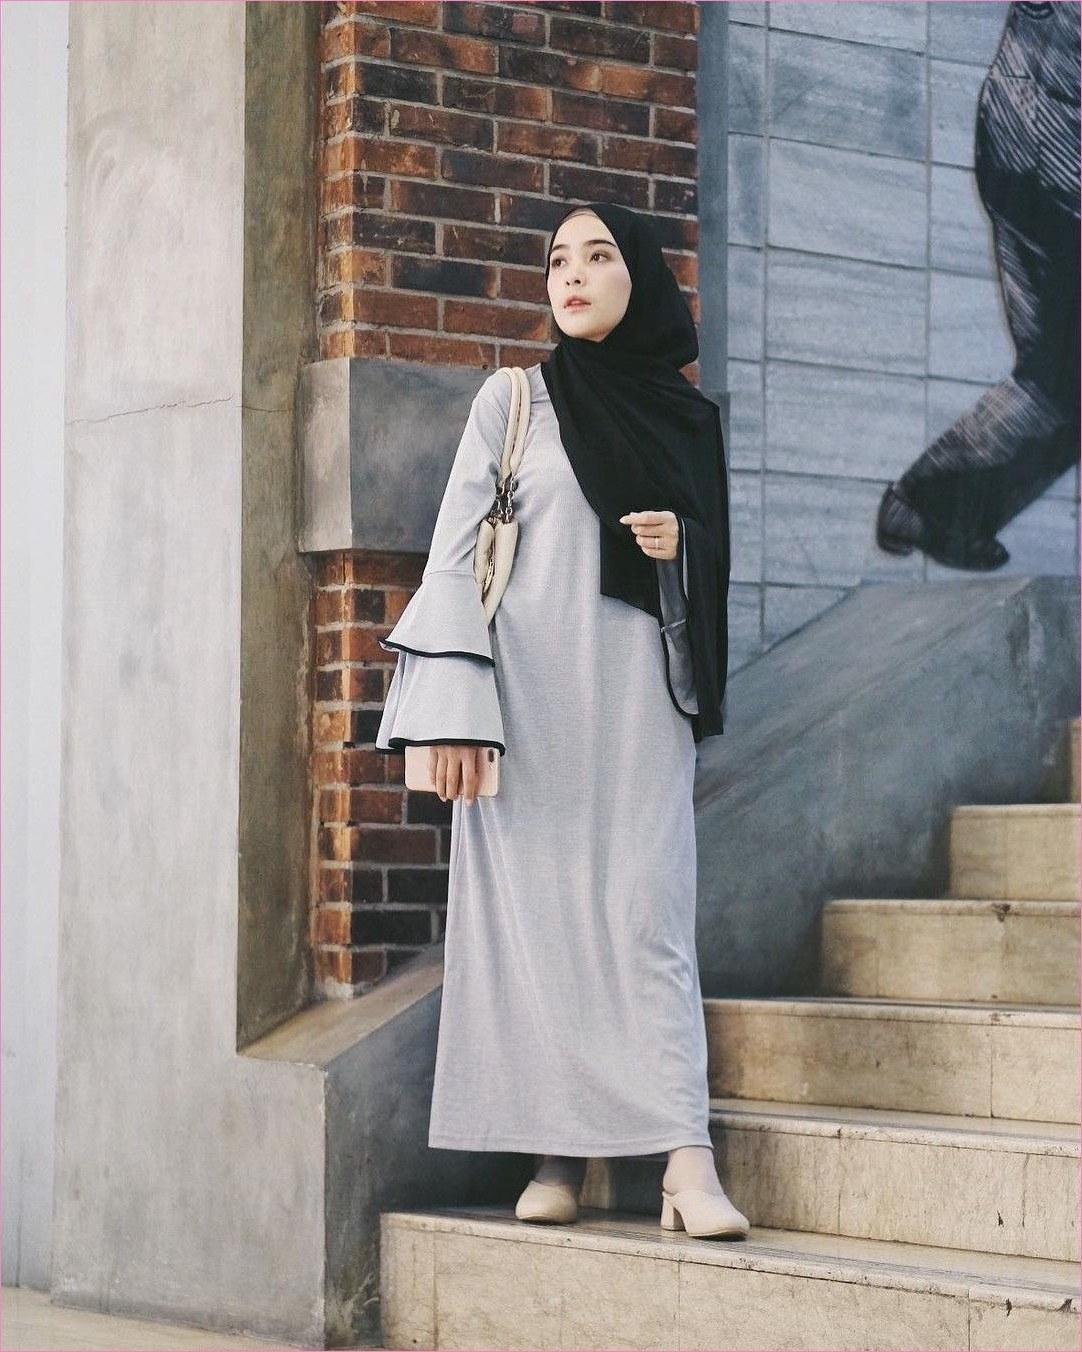 Design Baju Lebaran Ala Selebgram Q5df Outfit Baju Remaja Berhijab Ala Selebgram 2018 Pashmina